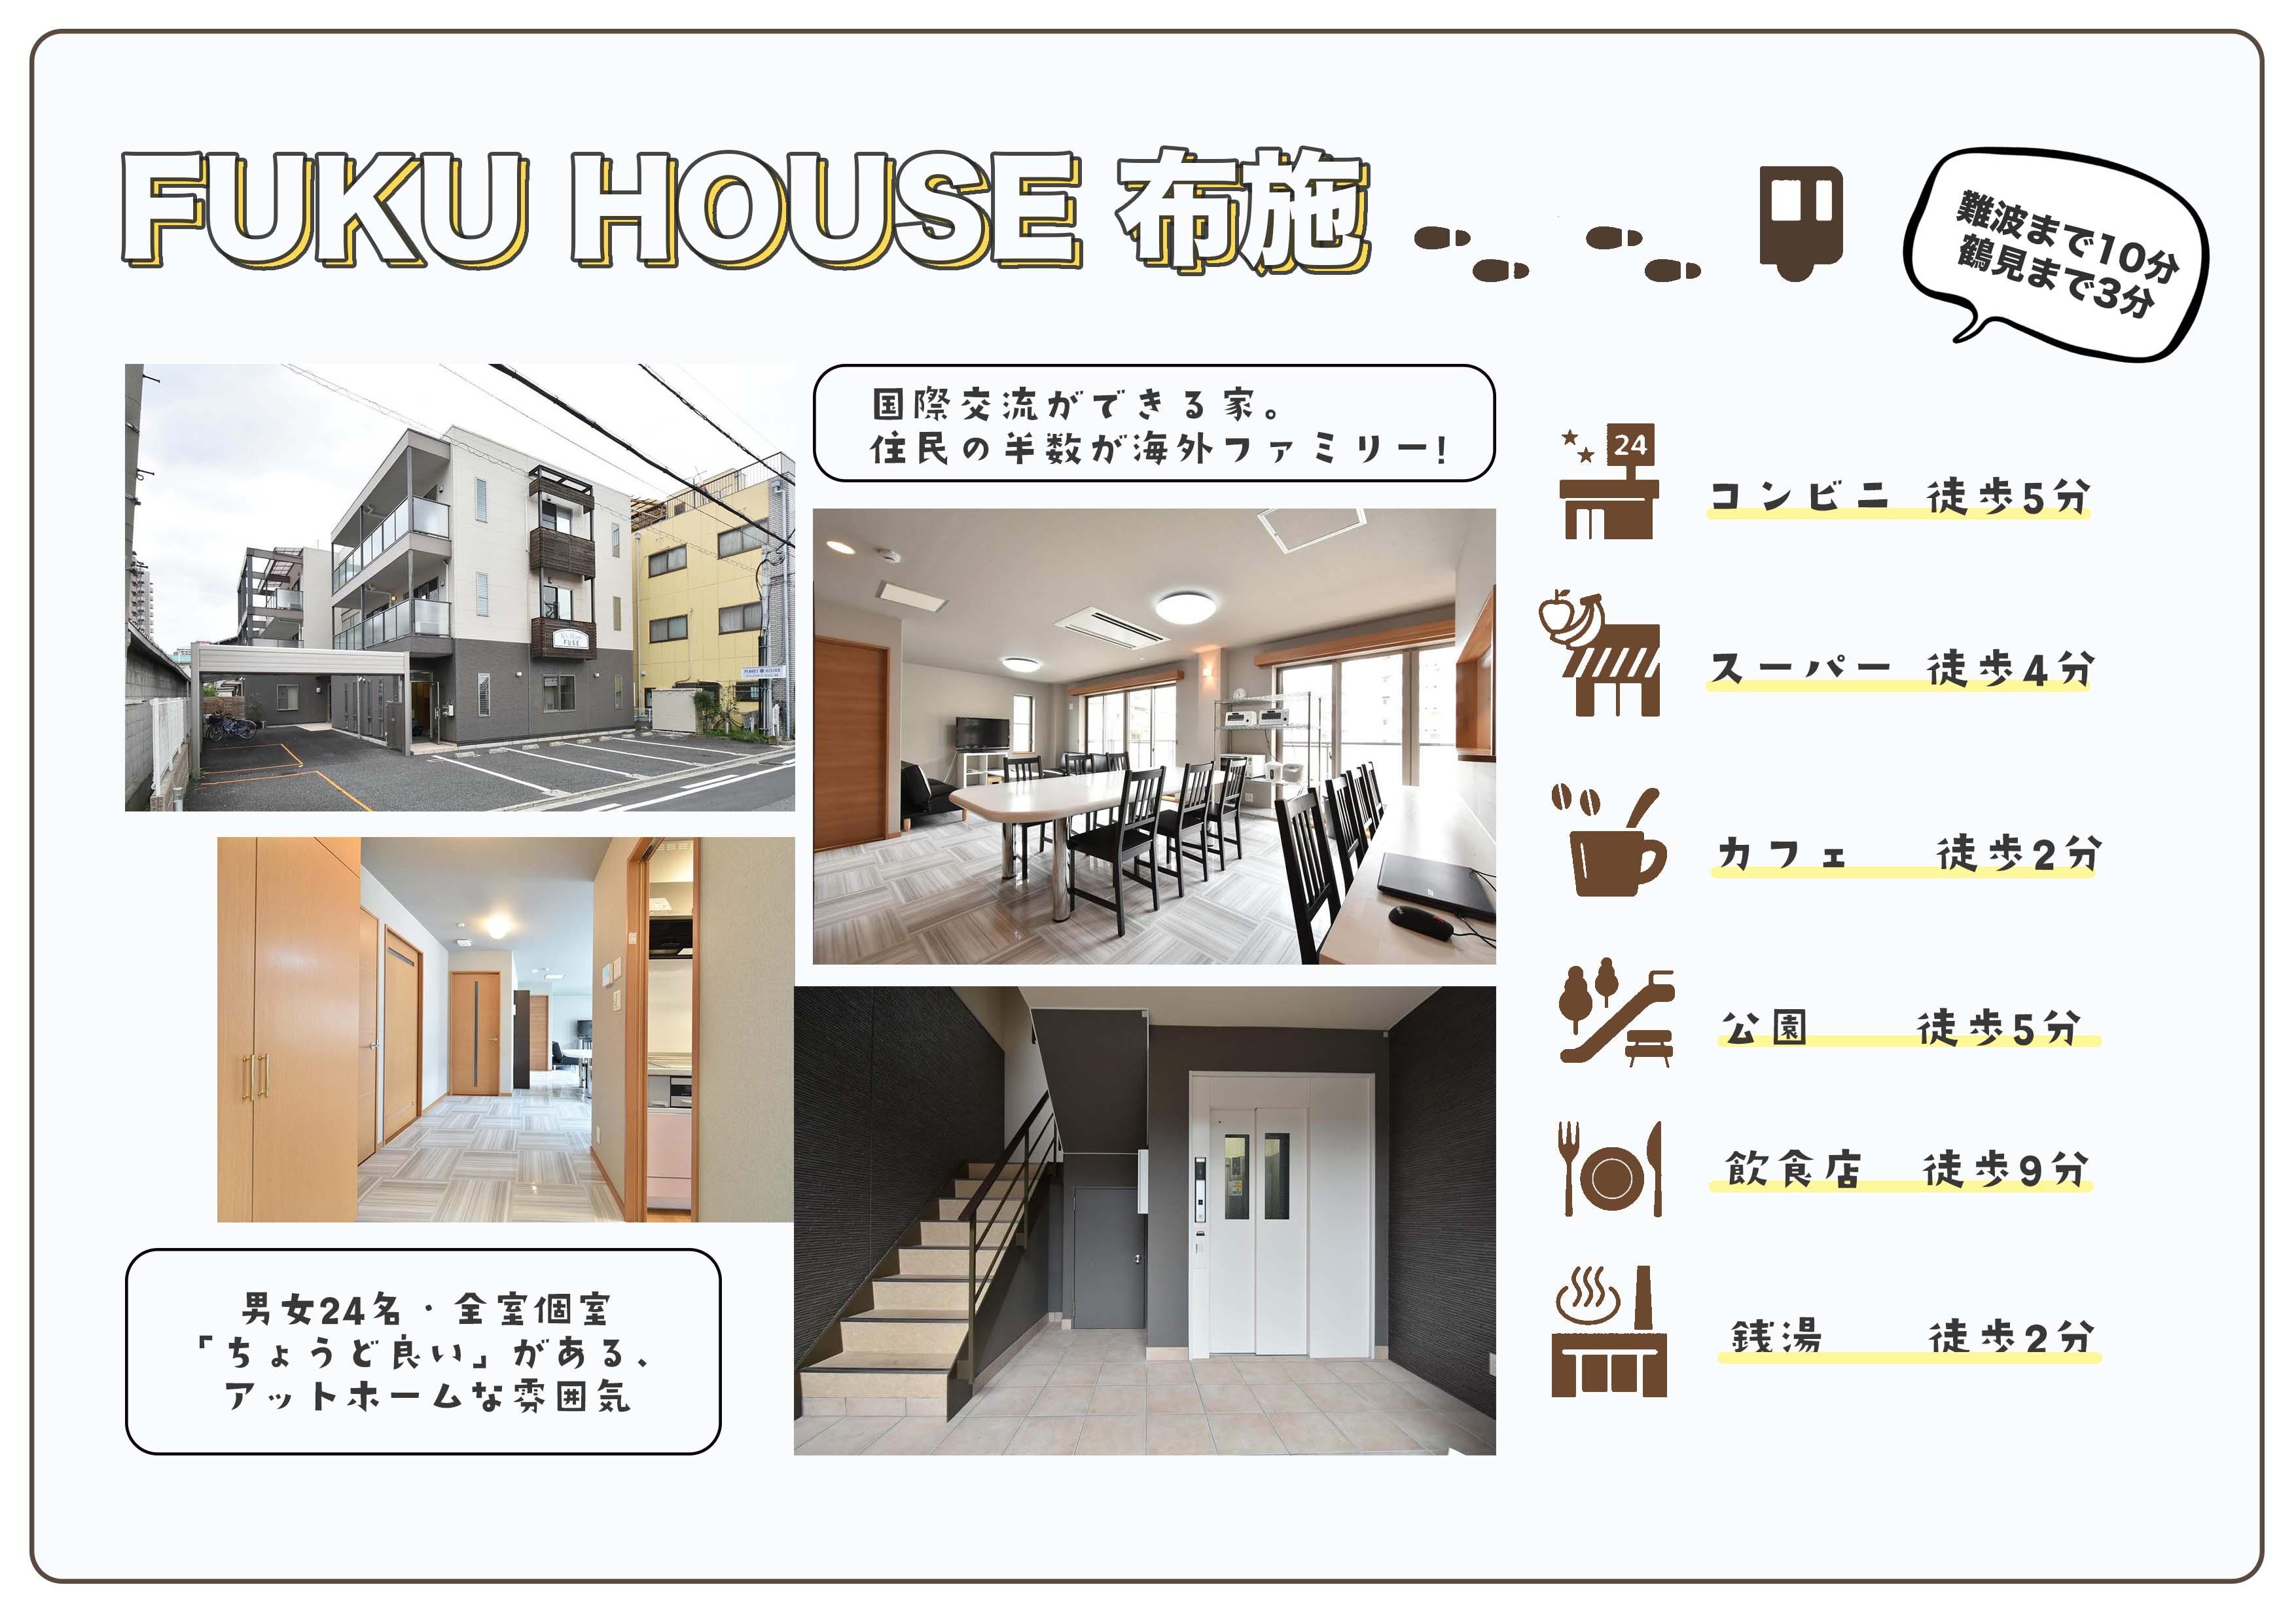 (JP) 知ってた!?11棟目の絆家シェアハウスは鶴橋・難波まですぐの好立地物件!